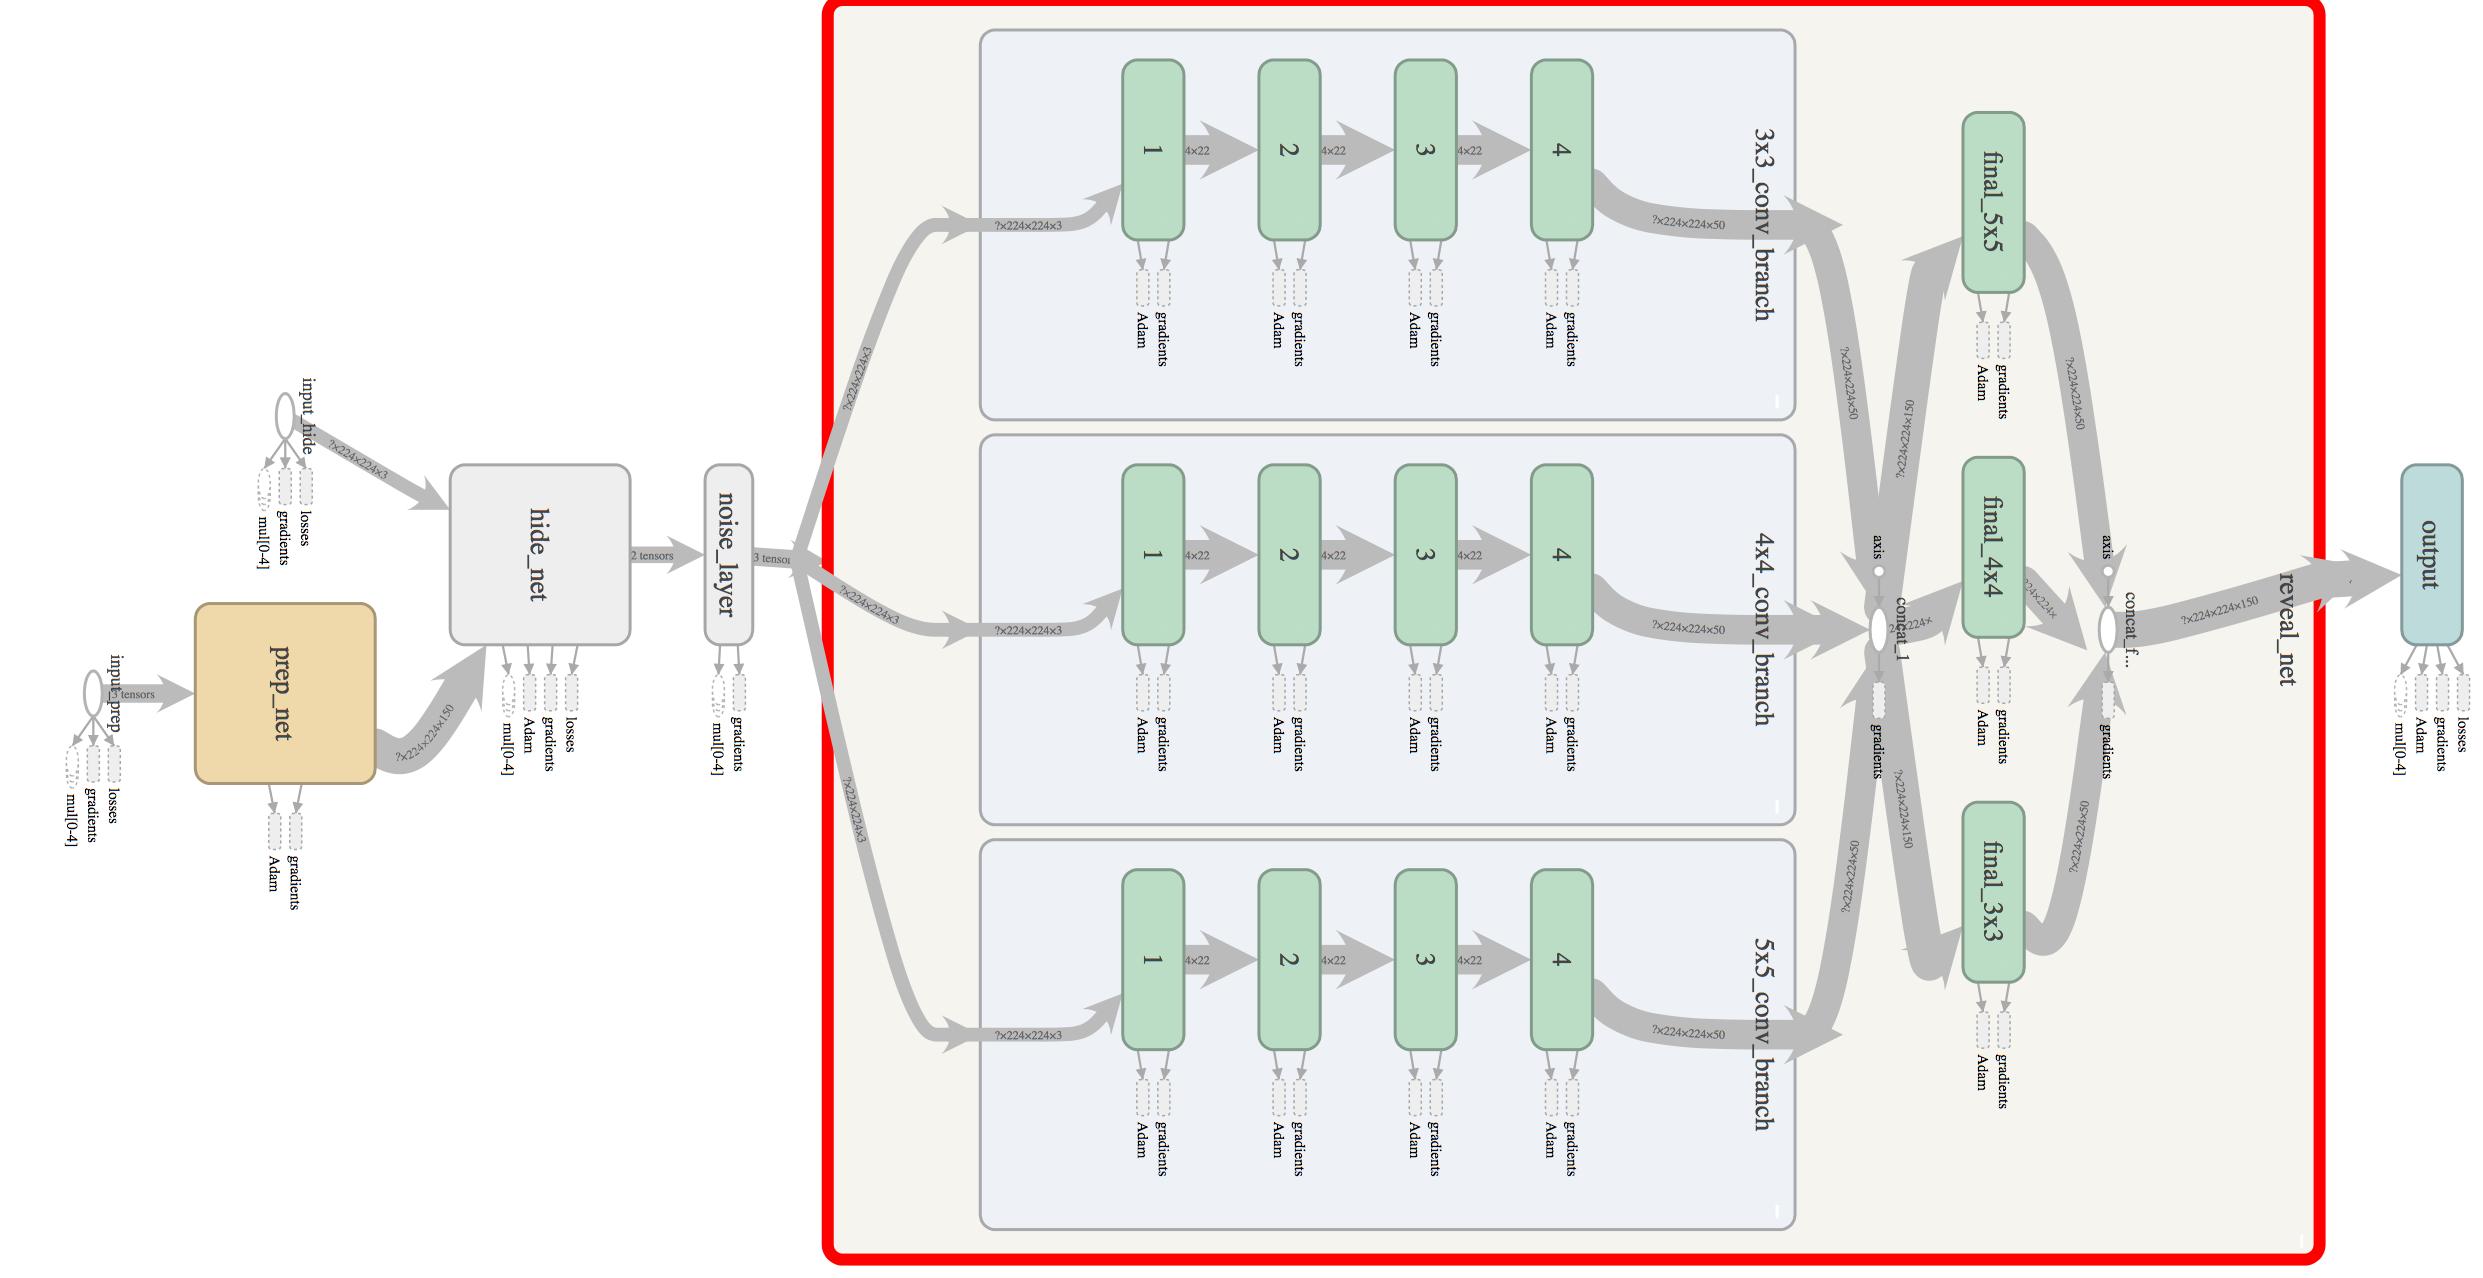 network_design